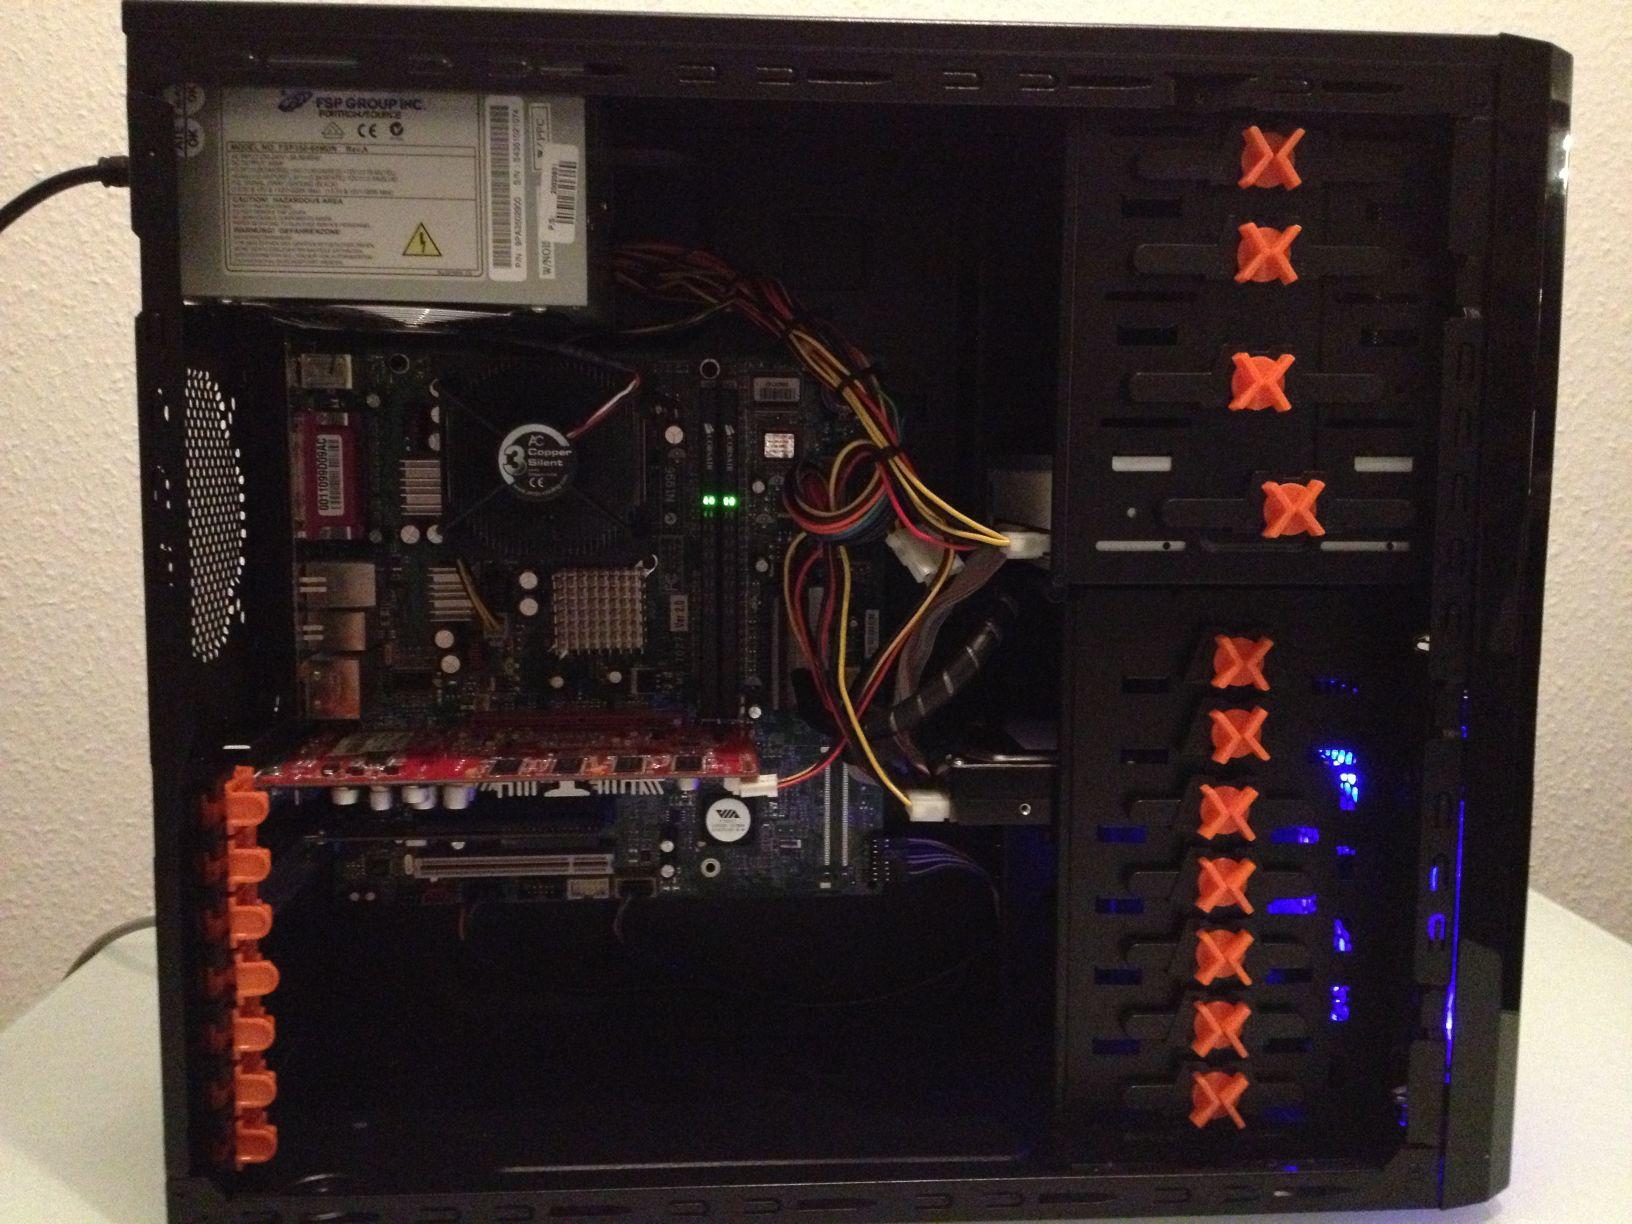 [TAGEBUCH] Quick & Dirty : Keller-Retro PC Tagebuch *Von wegen abgeschlossen* Chieftec CS 601 ;-)-image002.jpg